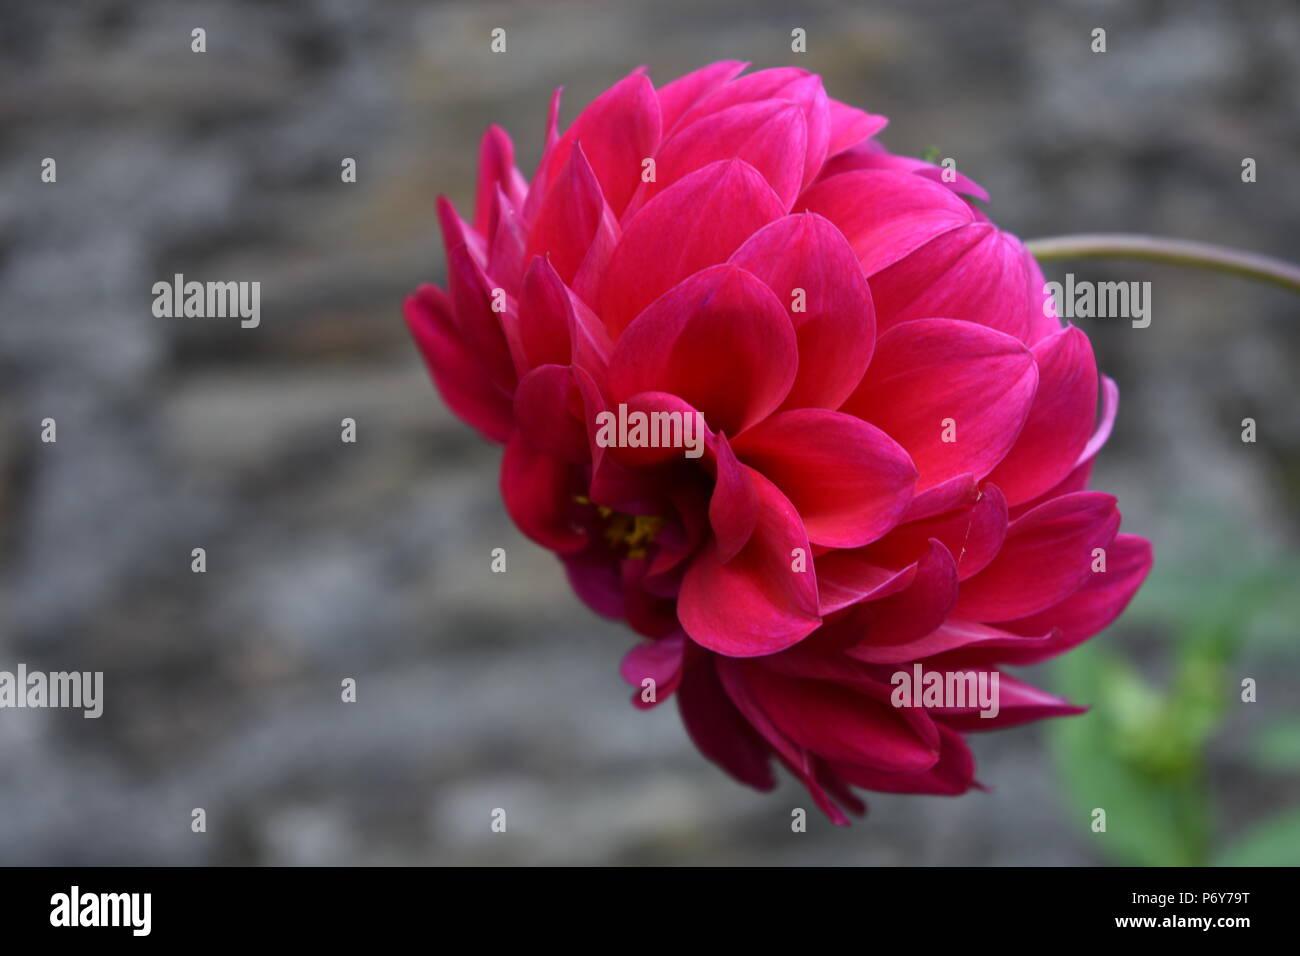 red flower of dahalia - Stock Image